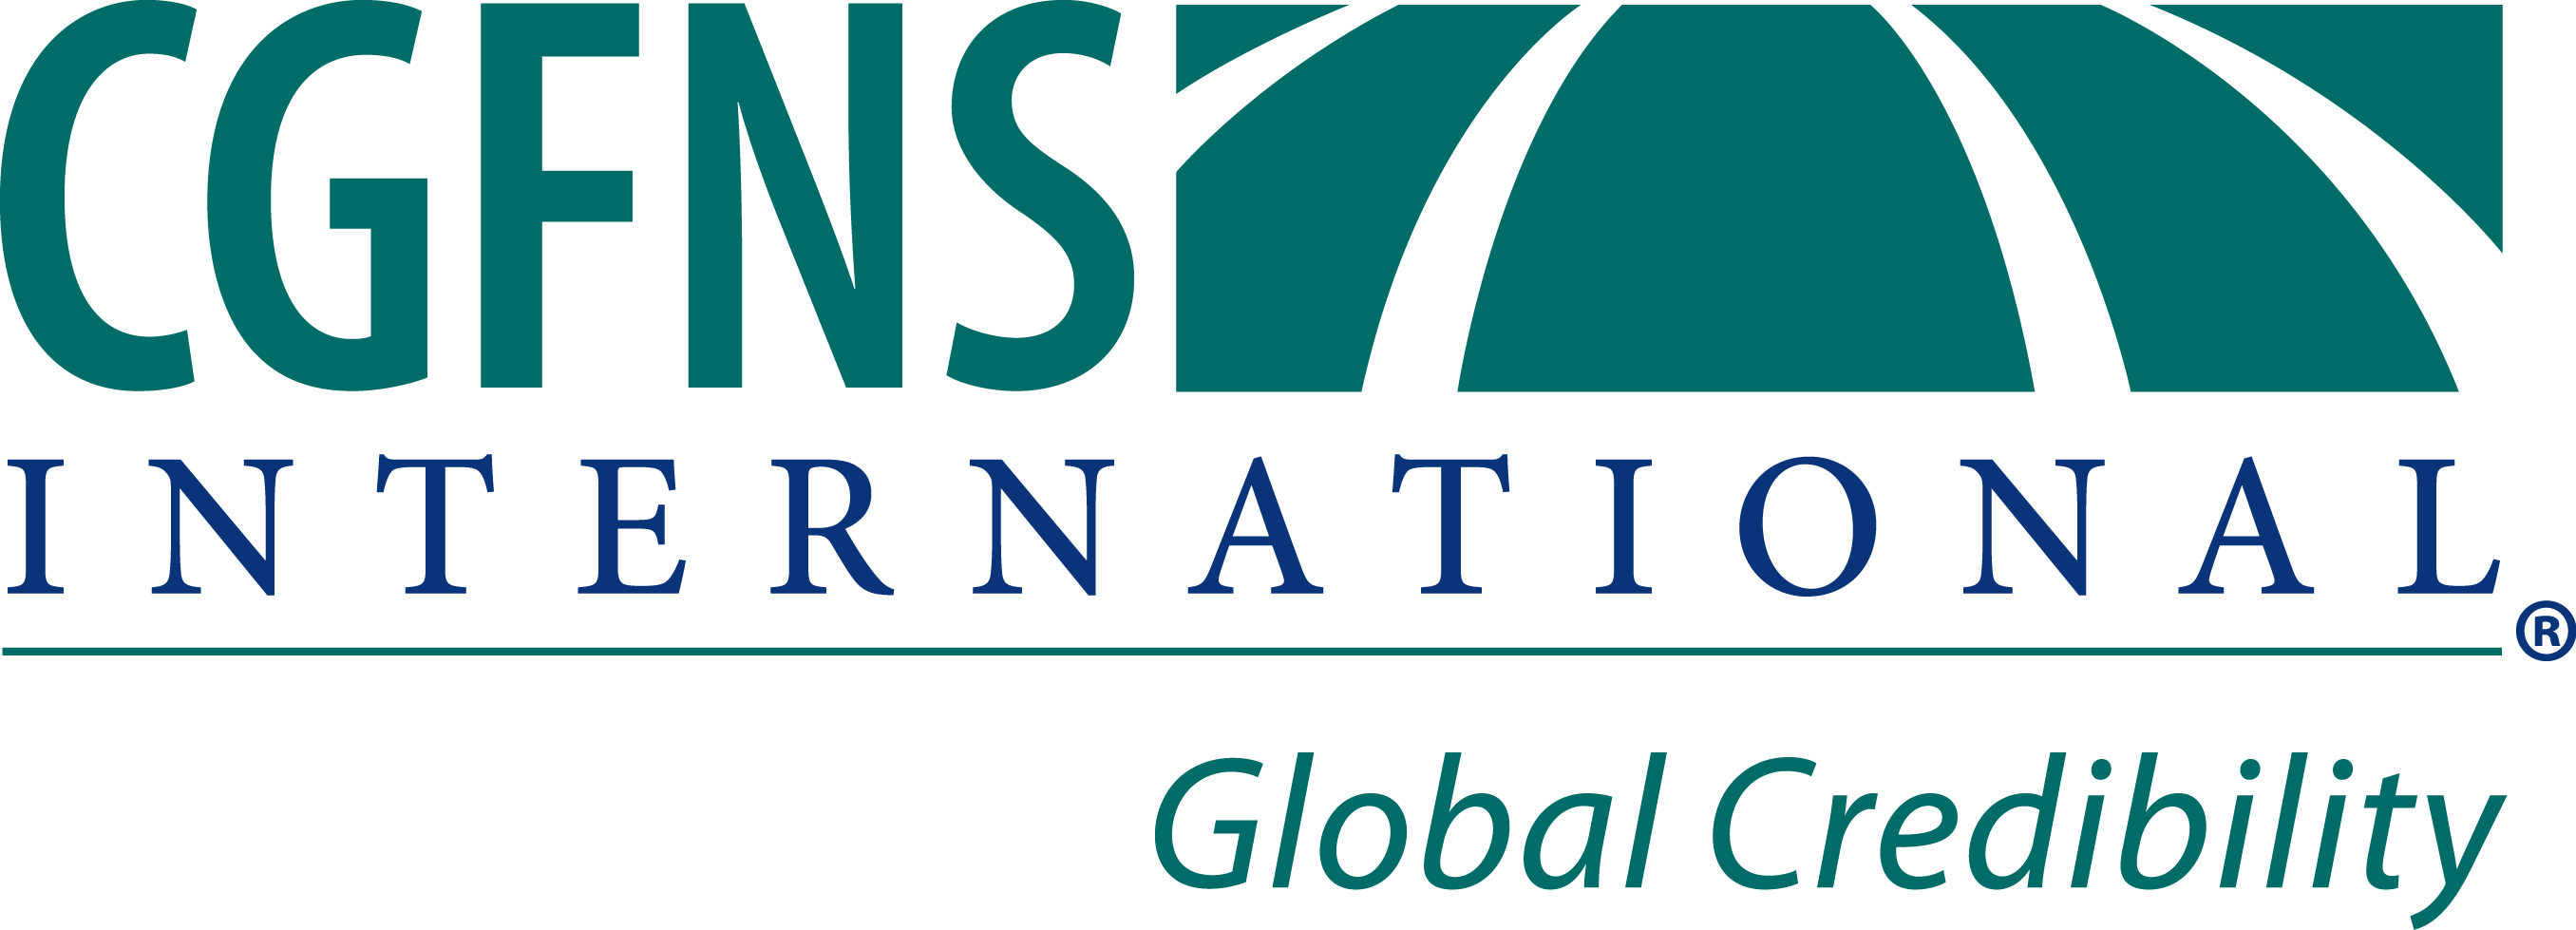 Cgfns International Logo Official 1 Cgfns International Inc